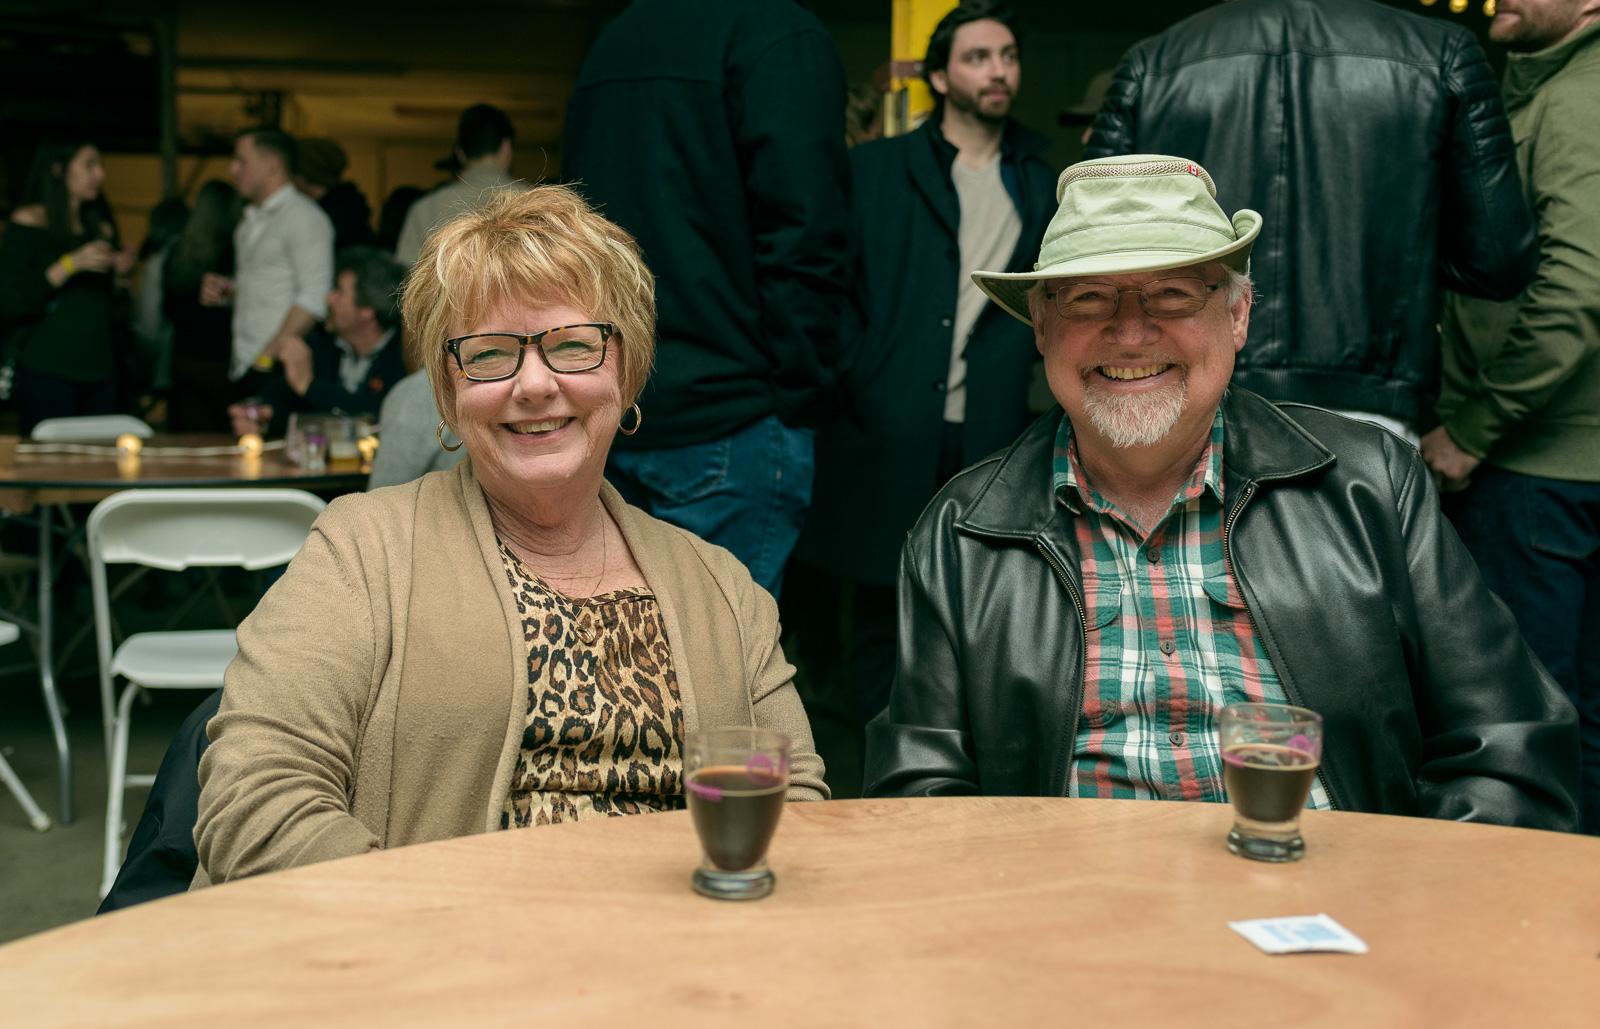 brewha-caskfest-blog-28.jpg